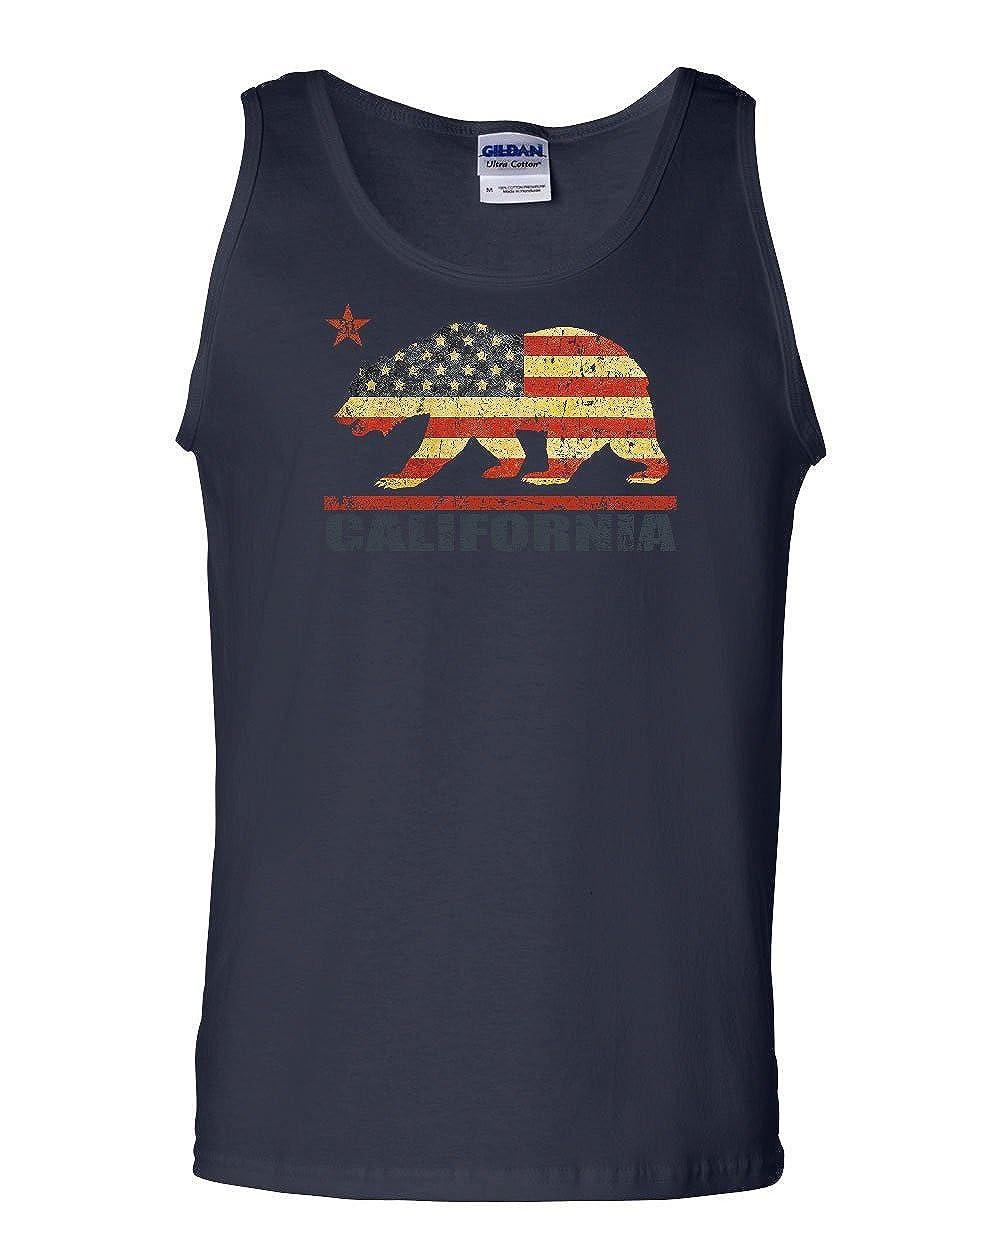 Tee Hunt Distressed California Republic Flag Tank Top Cali US Flag July 4 Sleeveless